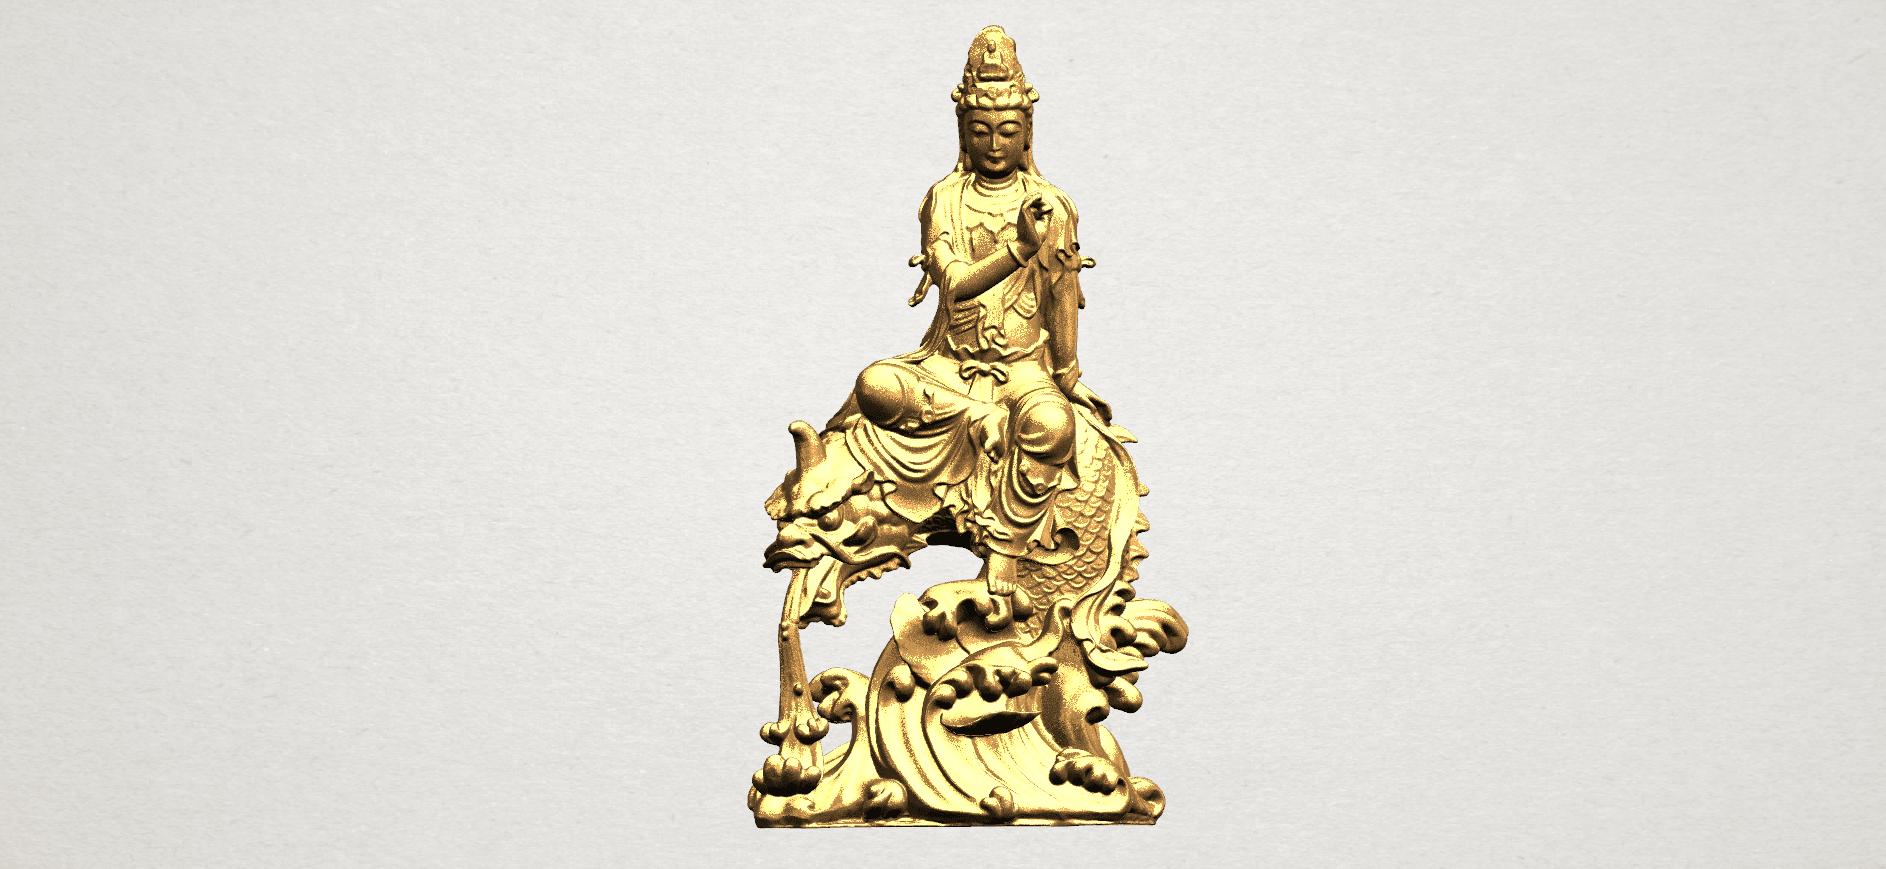 Avalokitesvara Bodhisattva (with fish) 88mm - A01.png Télécharger fichier 3DS gratuit Avalokitesvara Bodhisattva (avec poisson) 01 • Modèle imprimable en 3D, GeorgesNikkei